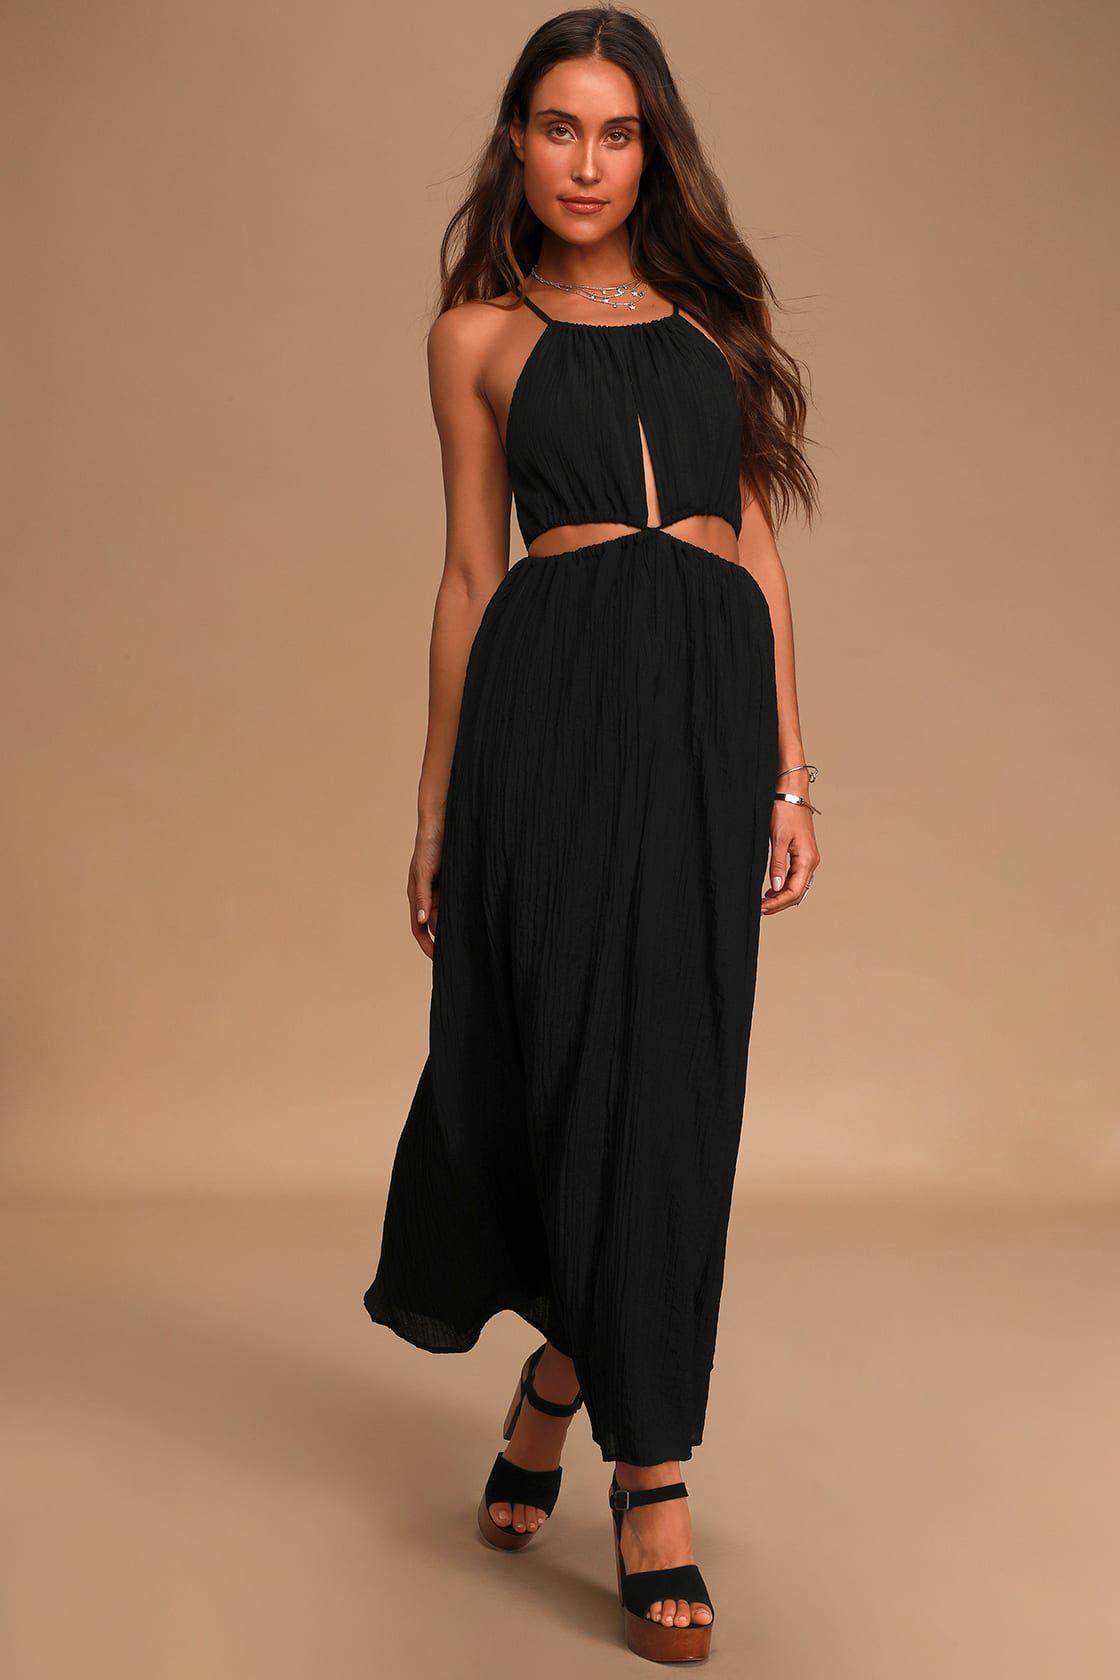 Streamlined Style Black Tie Back Cutout Maxi Dress In 2020 Cutout Maxi Dress Women Dress Online Maxi Dress [ 1680 x 1120 Pixel ]